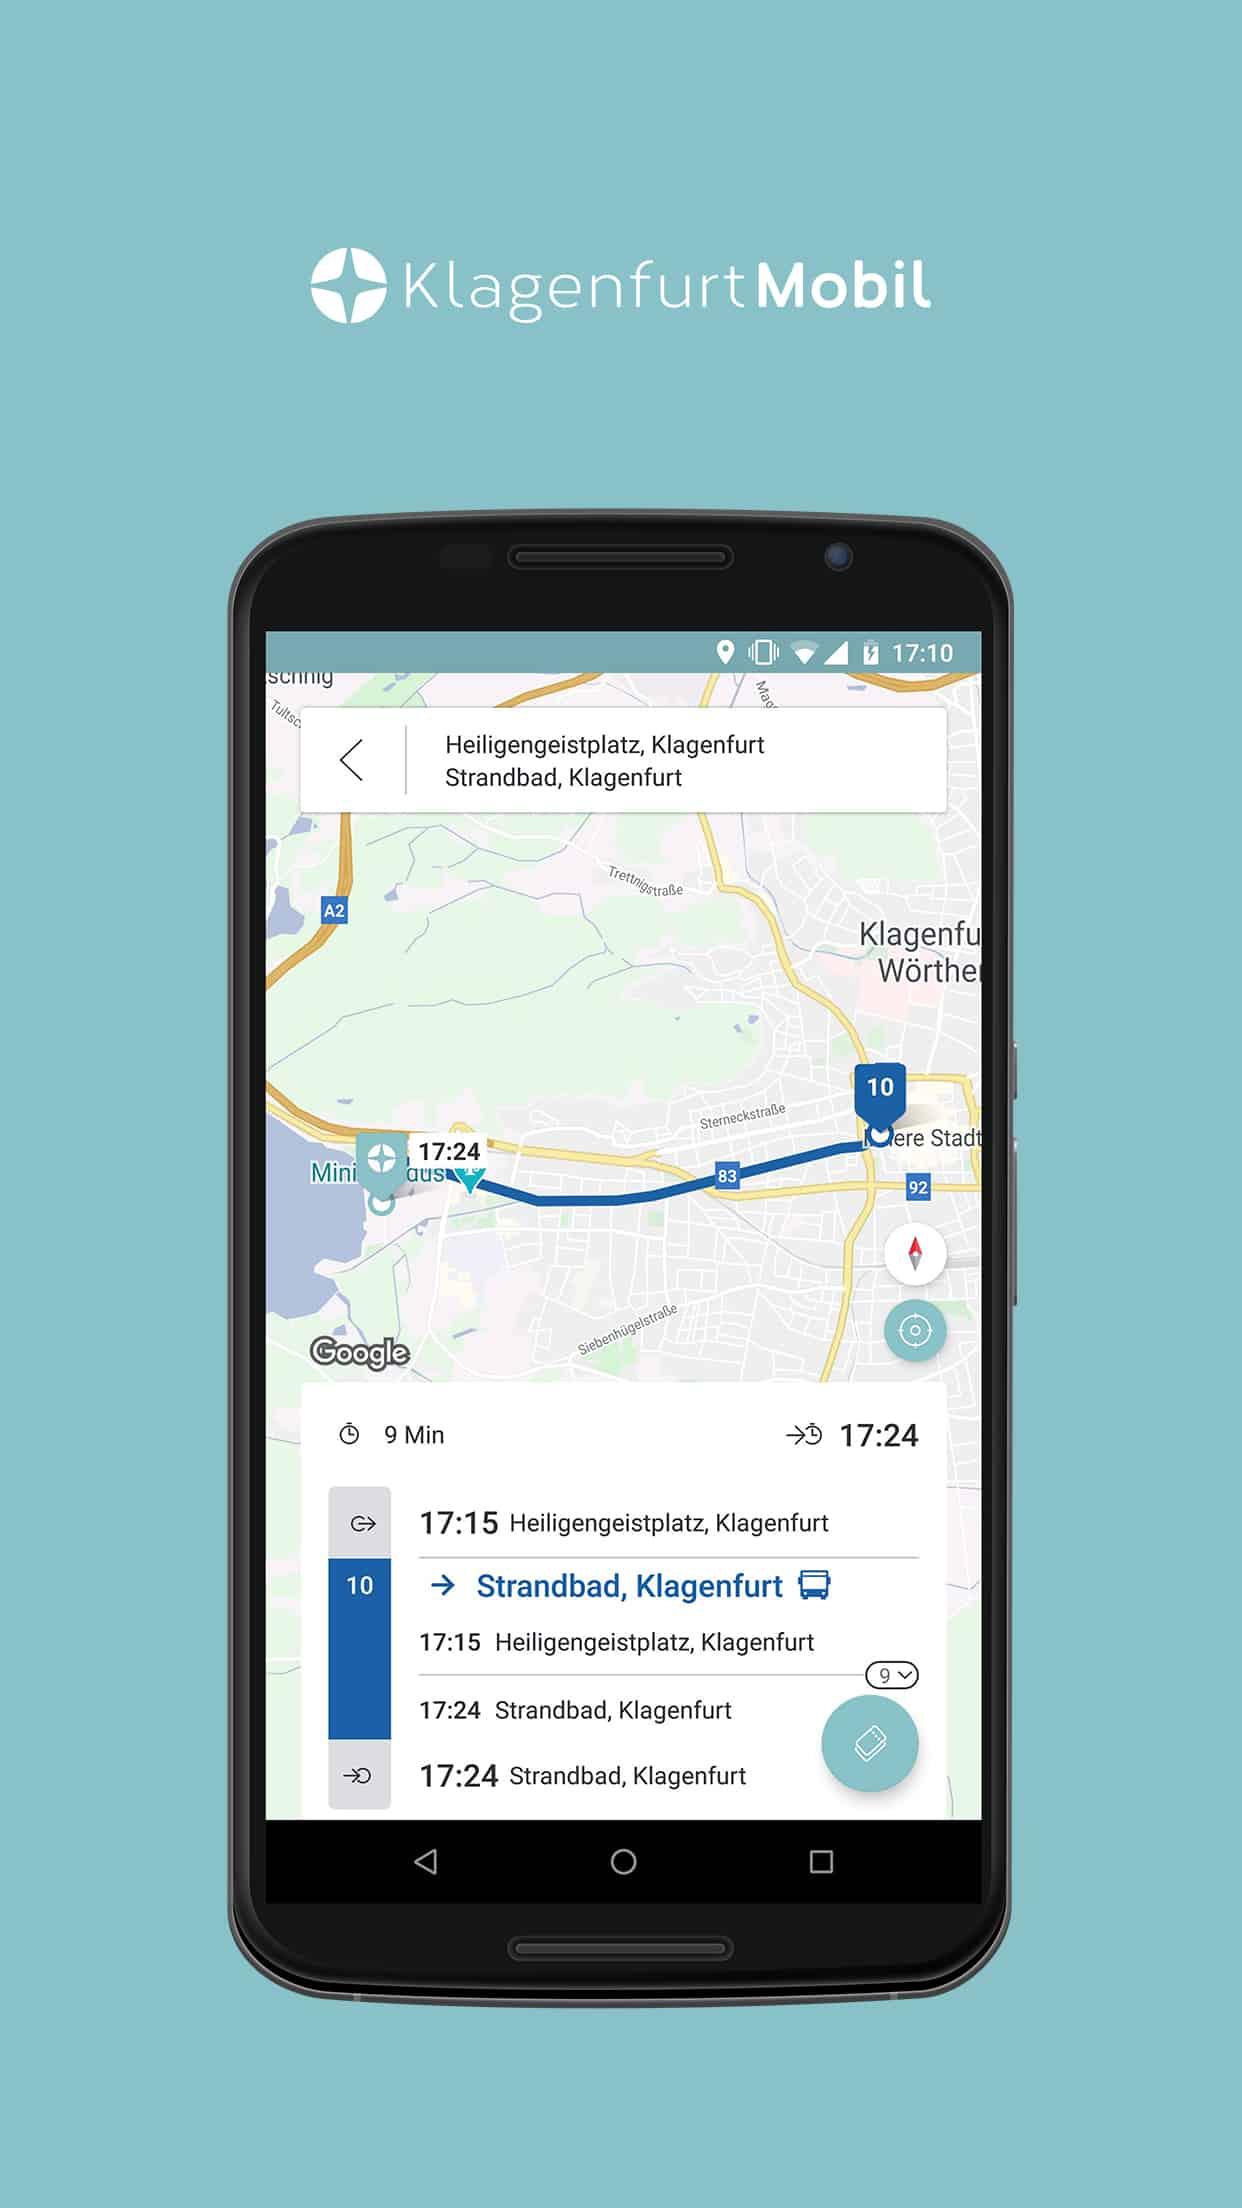 Klagenfurt Mobil App Routenvorschau